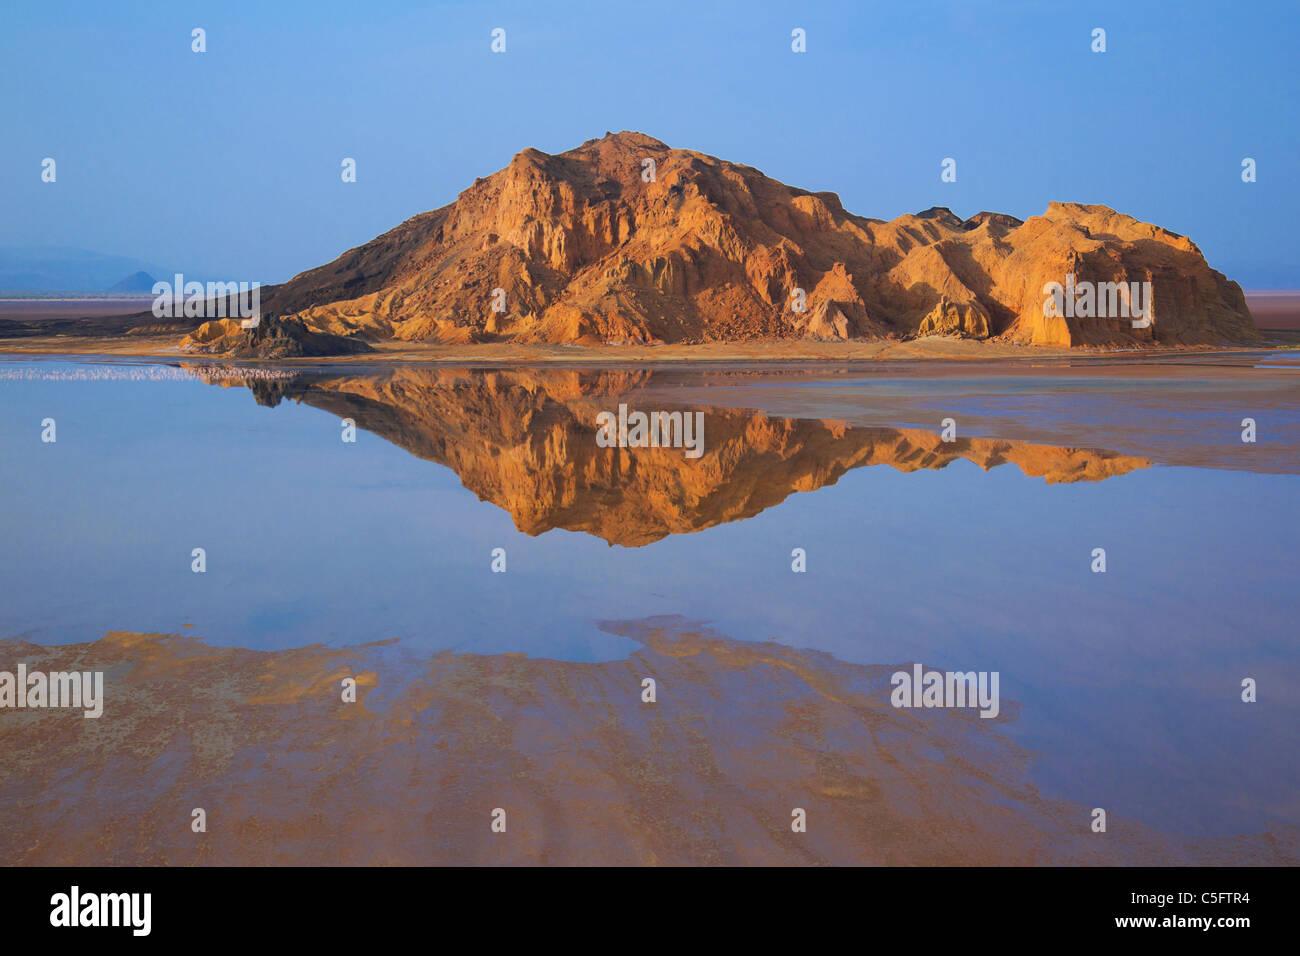 Lake logipi is a saline alkaline lake that lies in the Suguta valley in northen Kenya - Stock Image